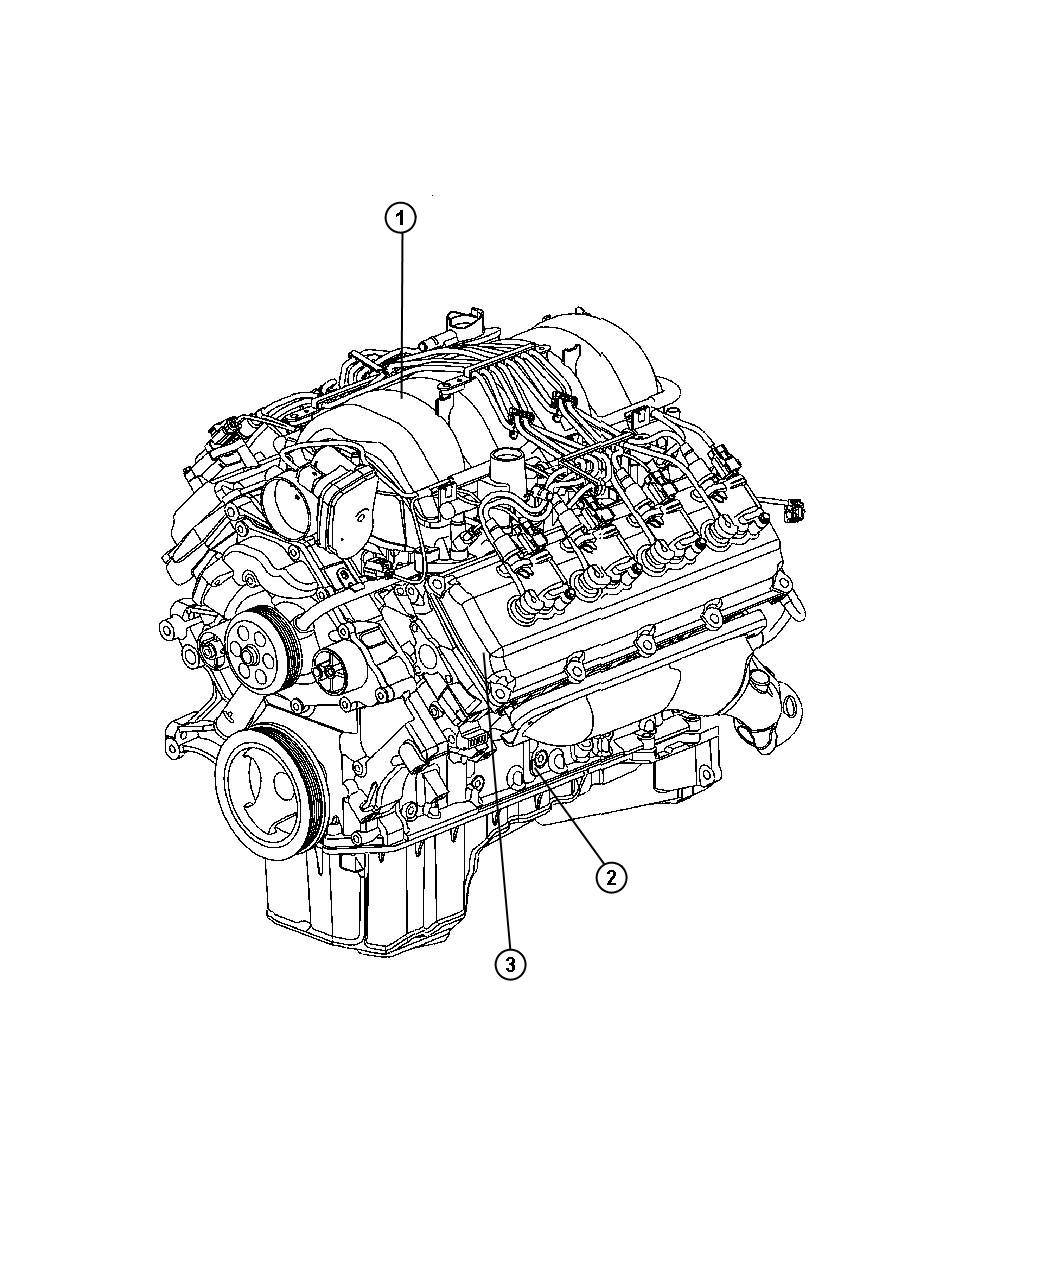 Dodge Charger R T 5 7l Hemi V8 Engine Long Block